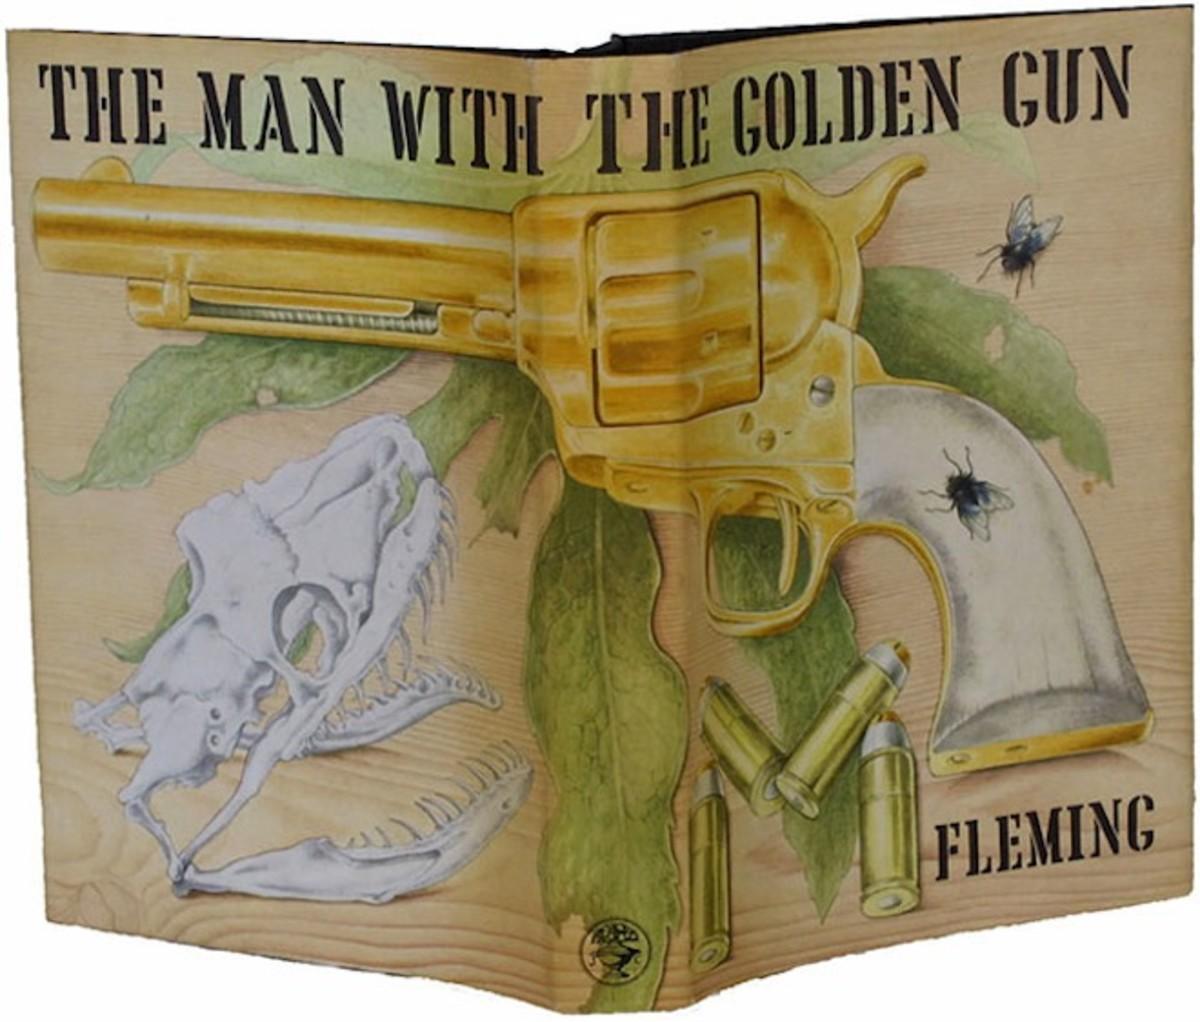 man-with-the-golden-gun-book-cover_ian-fleming